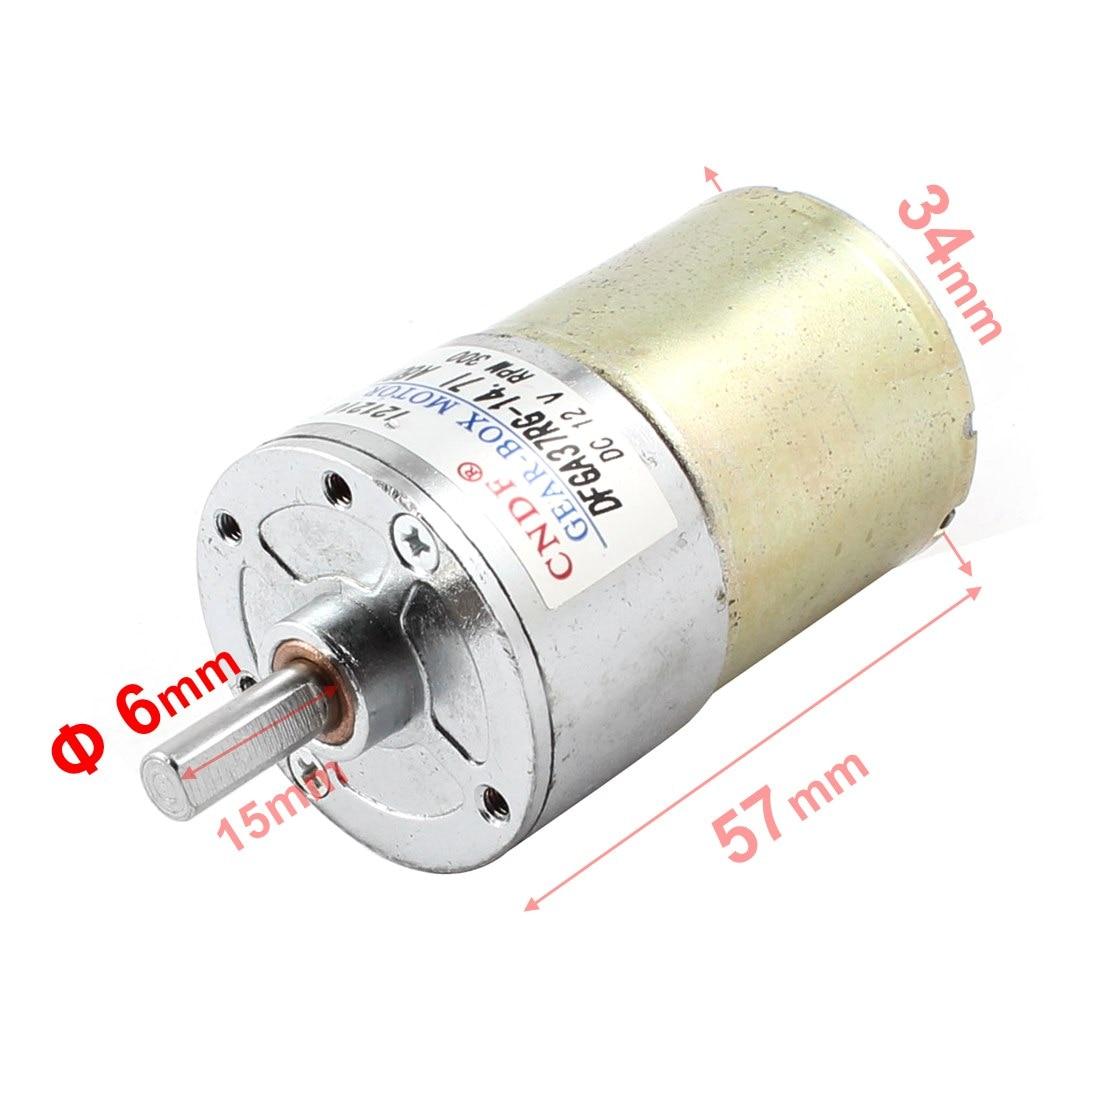 UXCELL 300Rpm 12V High Torque Electric Speed Reduce  Gear Box Motor<br><br>Aliexpress